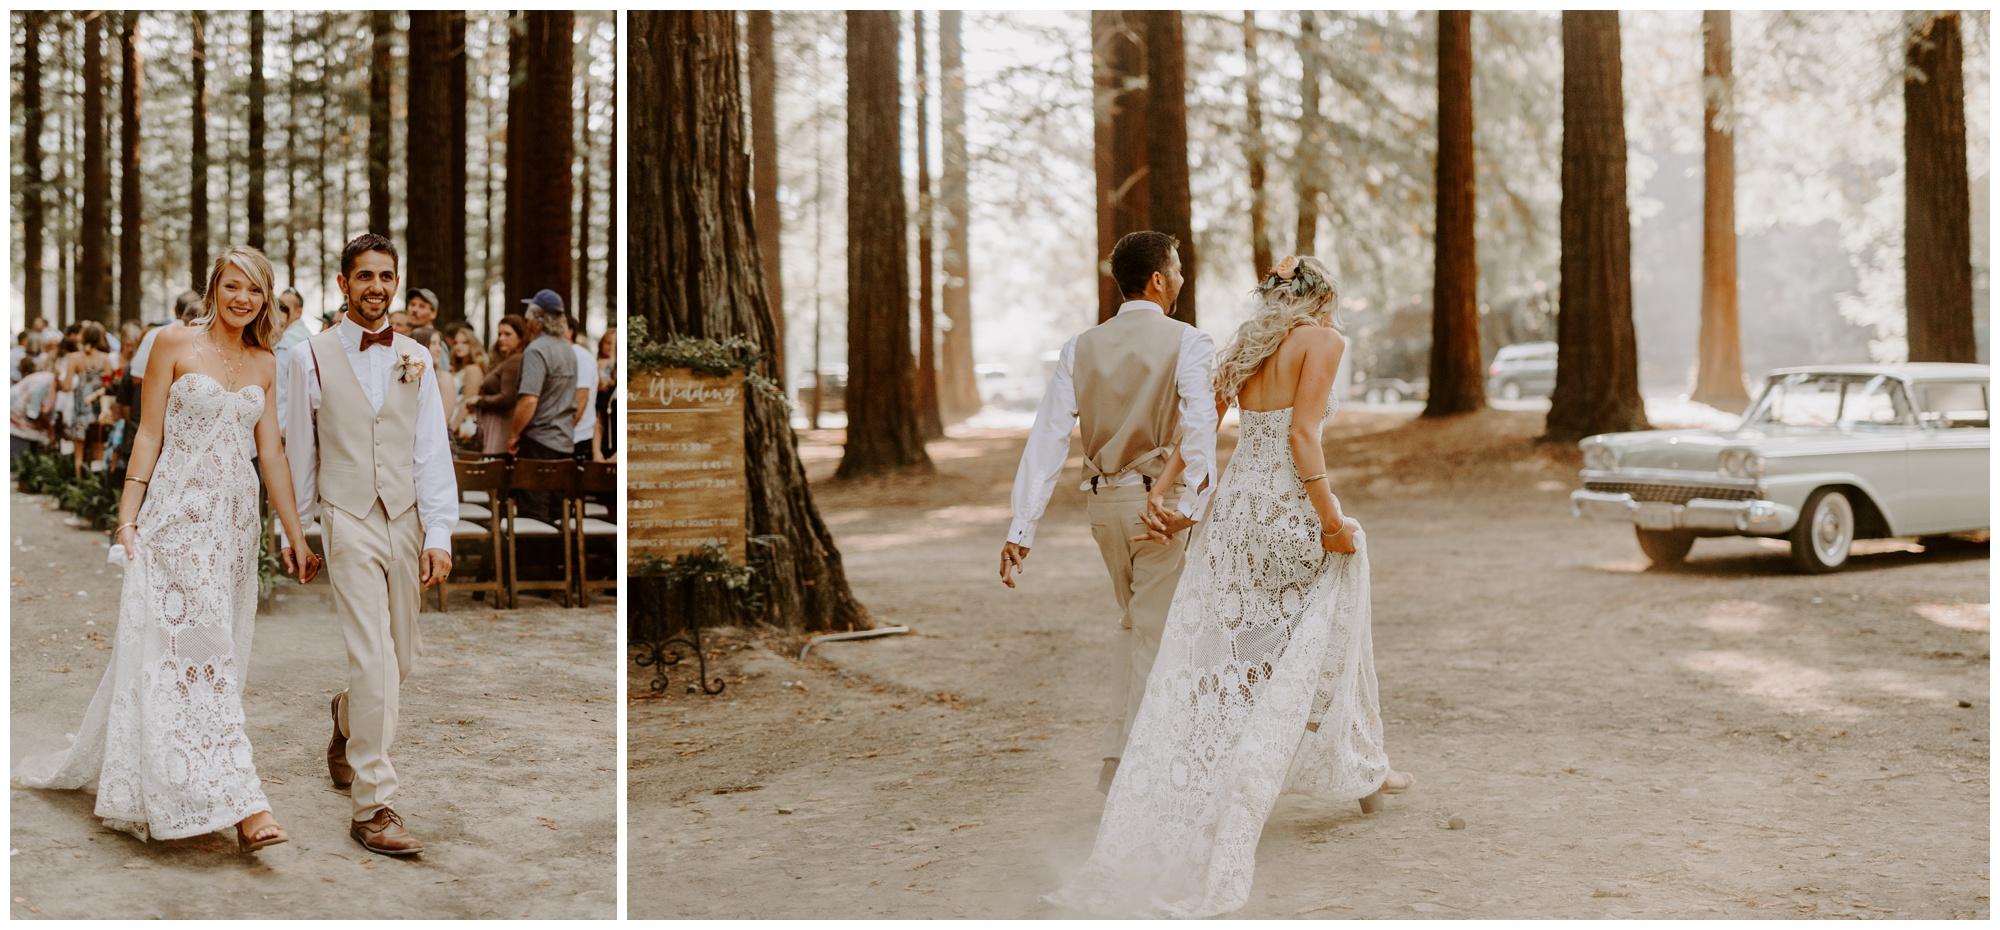 Redwood Festival Wedding Humbolt California - Jessica Heron Images_0039.jpg